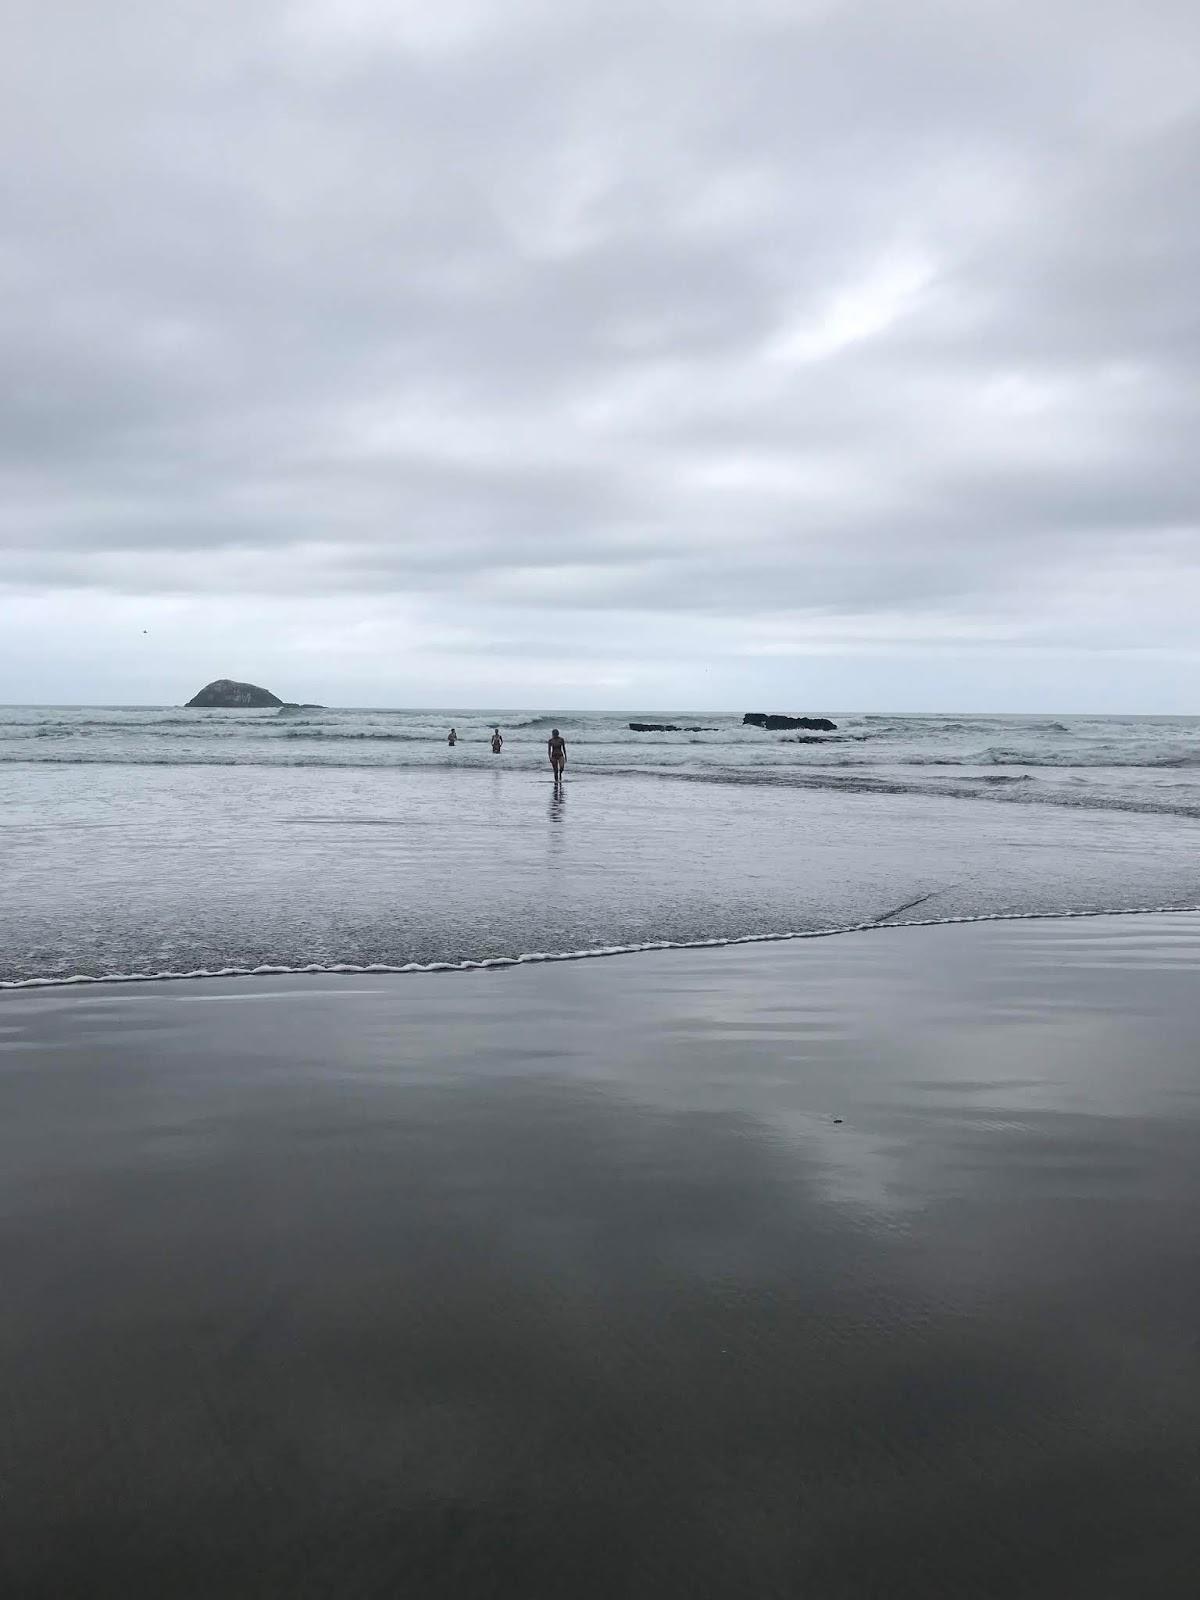 Maori Bay, Muriwai, Auckland, New Zealand